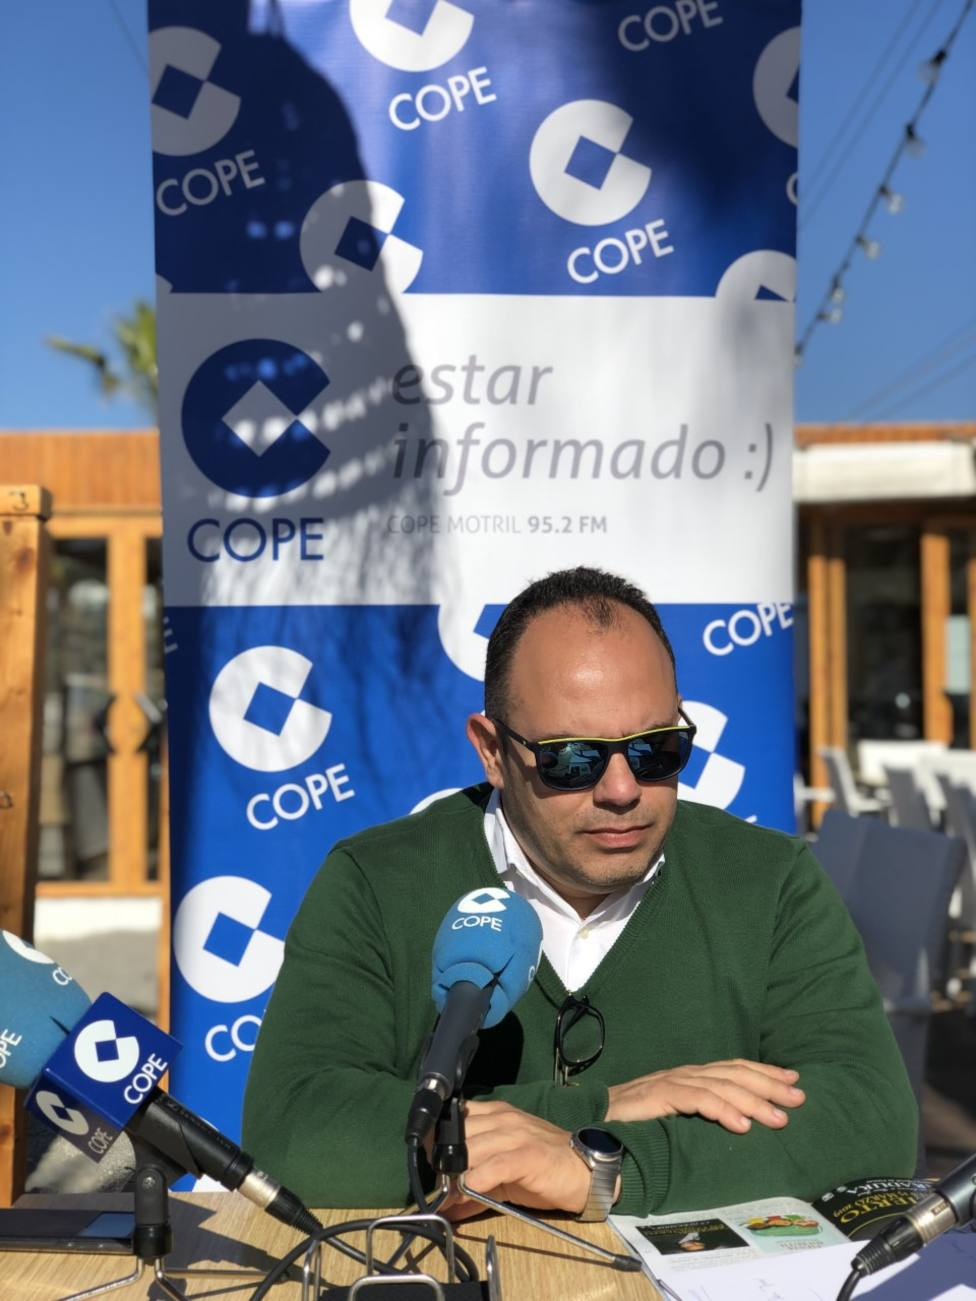 Juan José Ruíz Joya